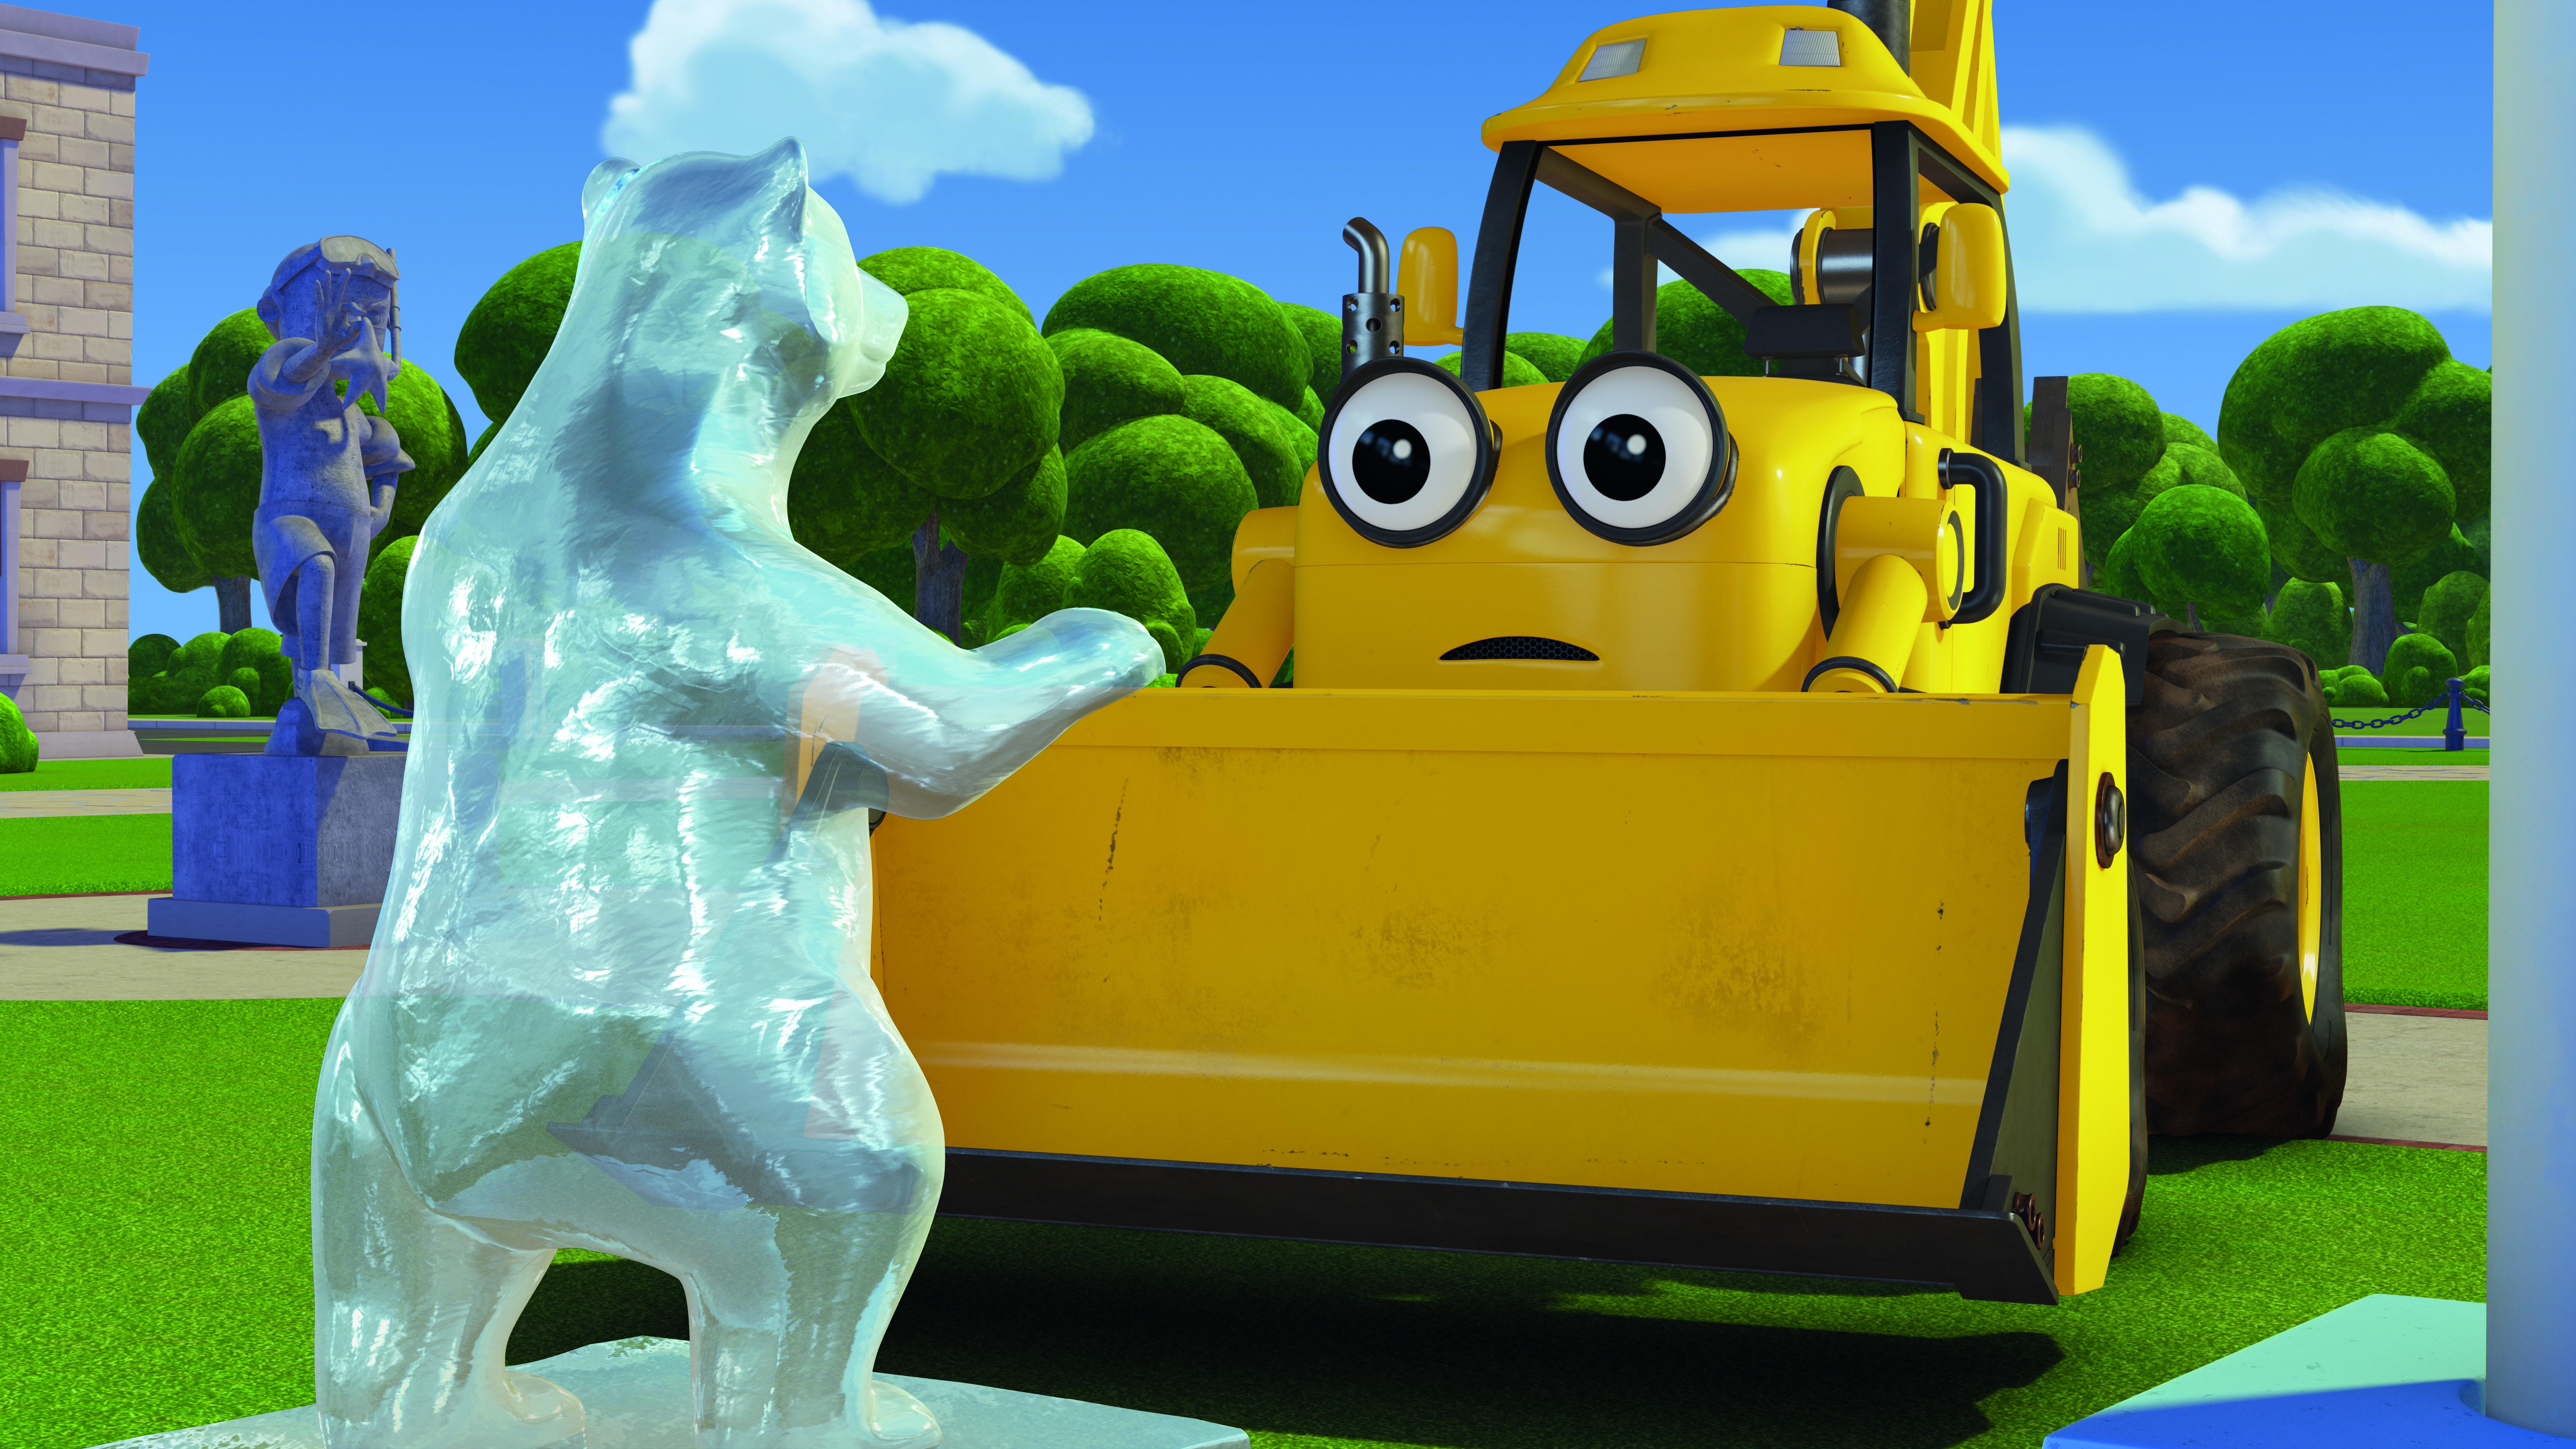 BTB_1002_EP_66_Ice_Cold_Fixham_Image_10.jpg